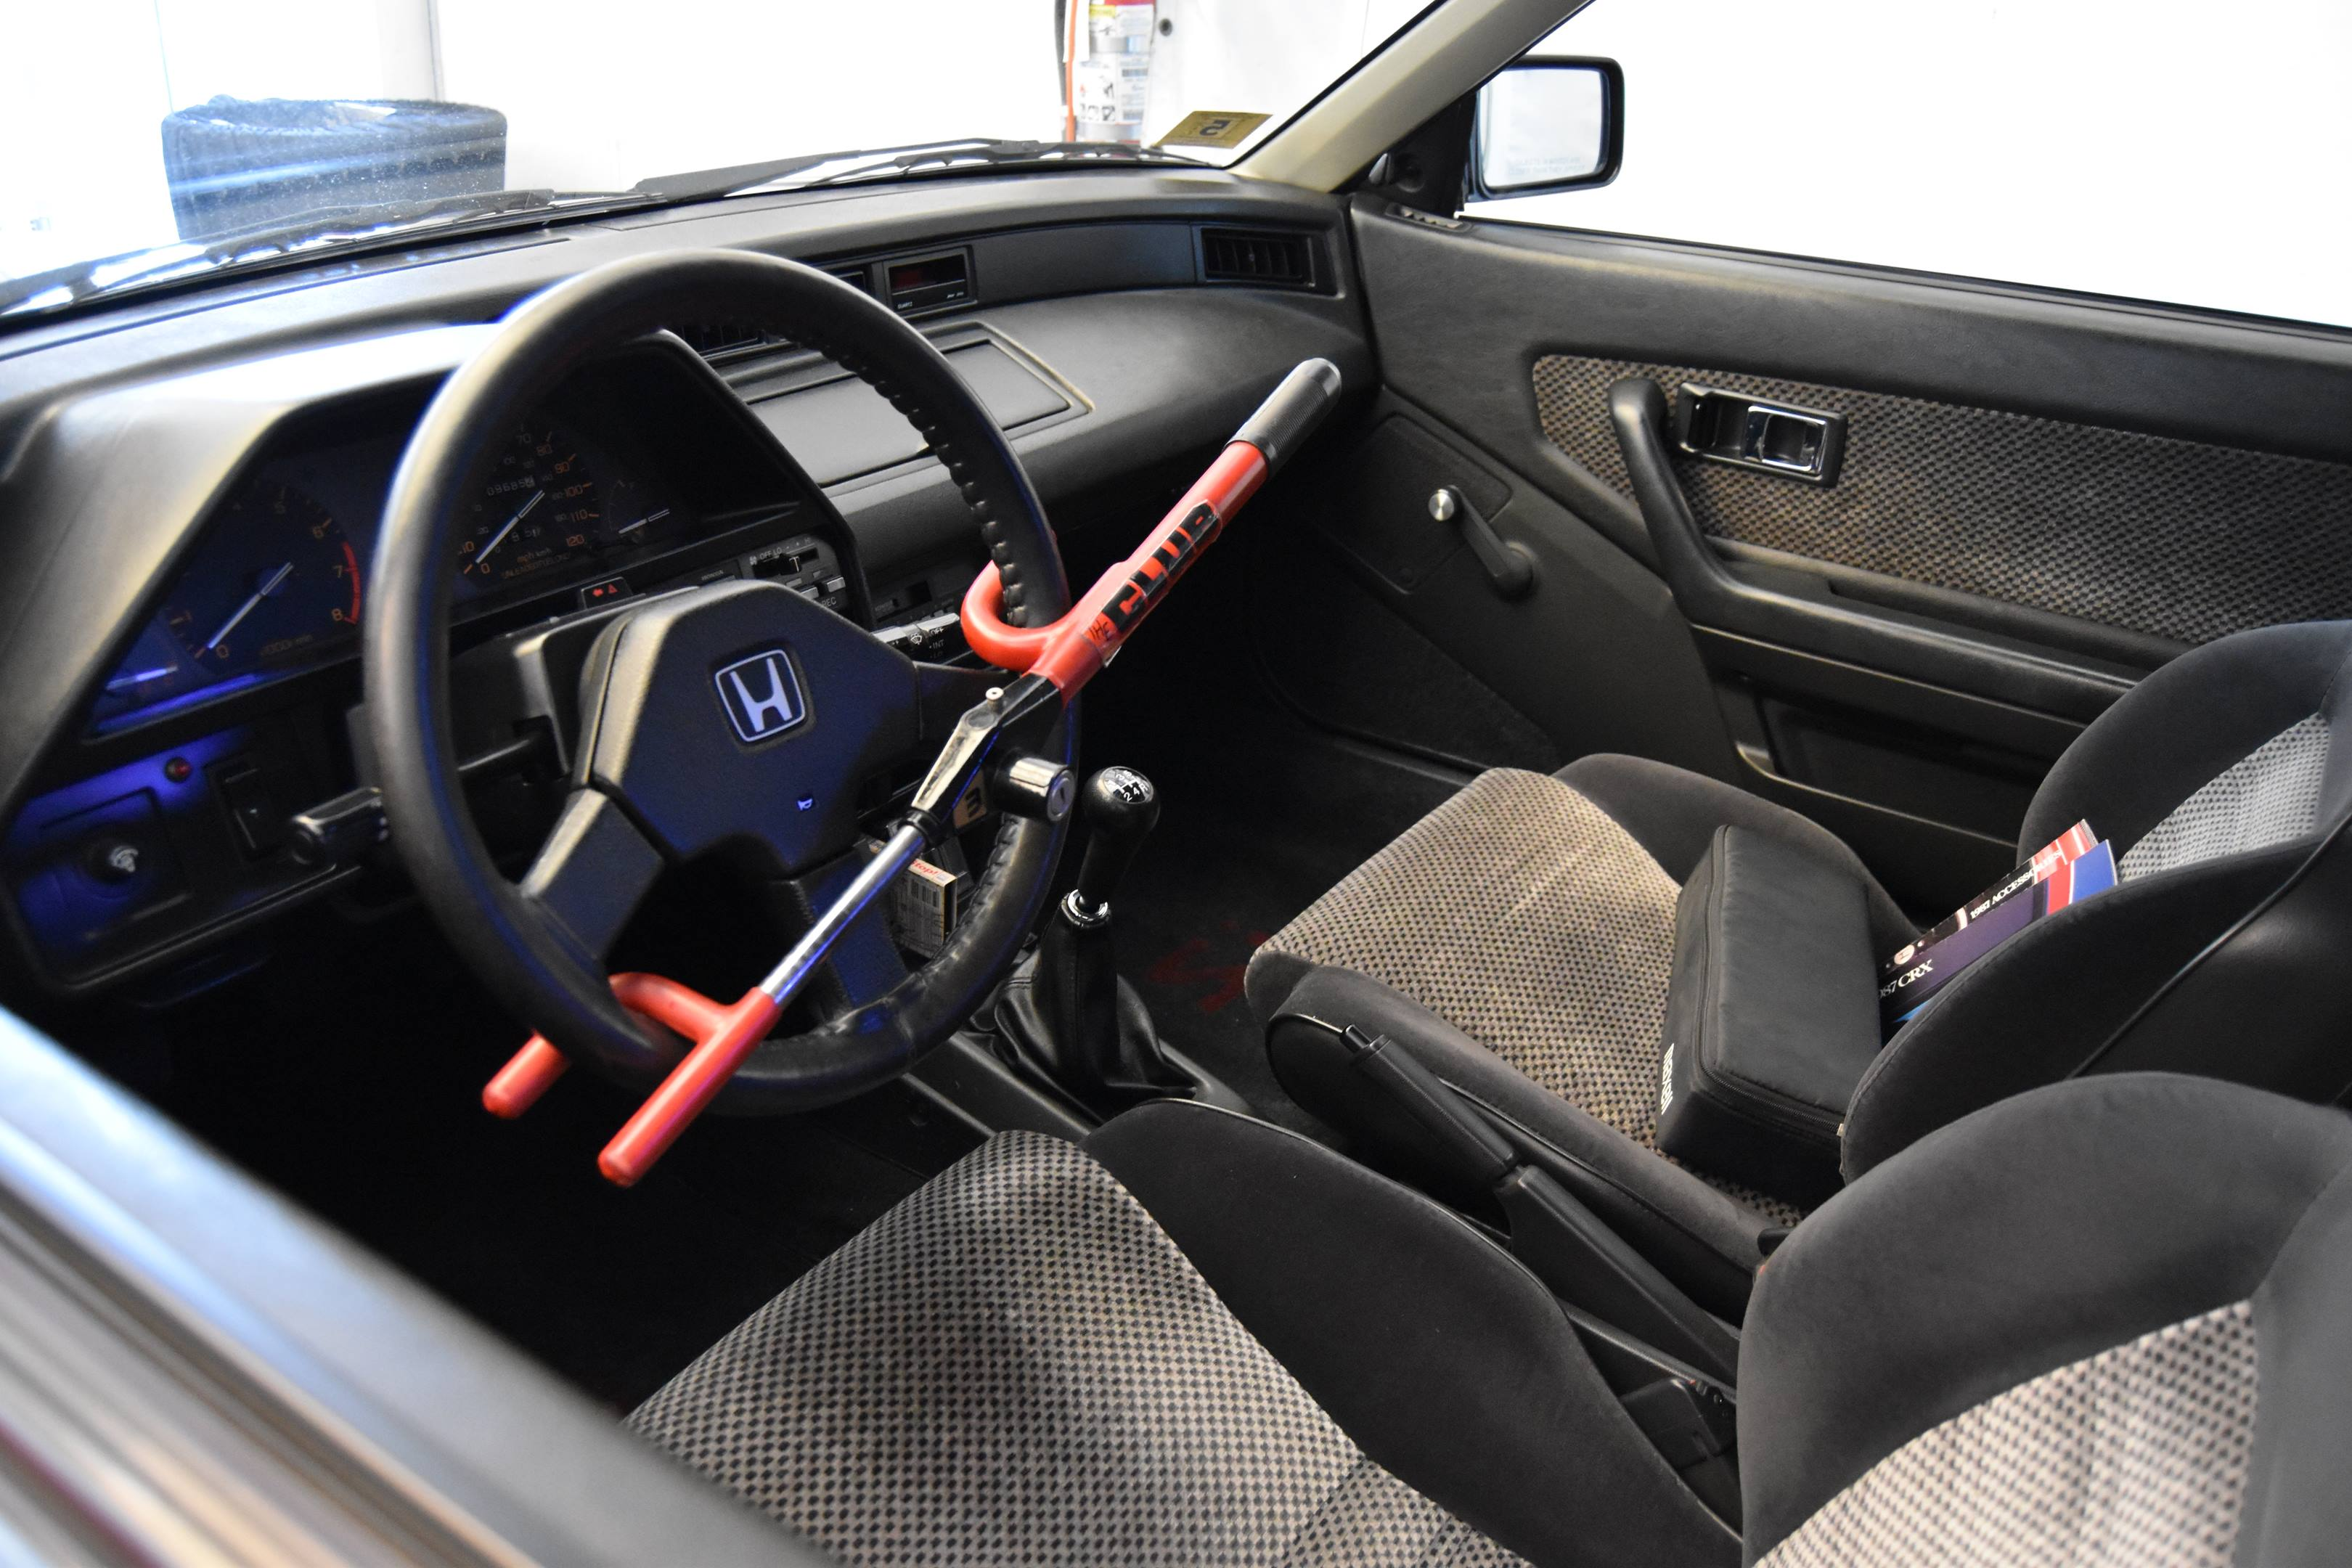 1987 Honda Civic CRX Si interior